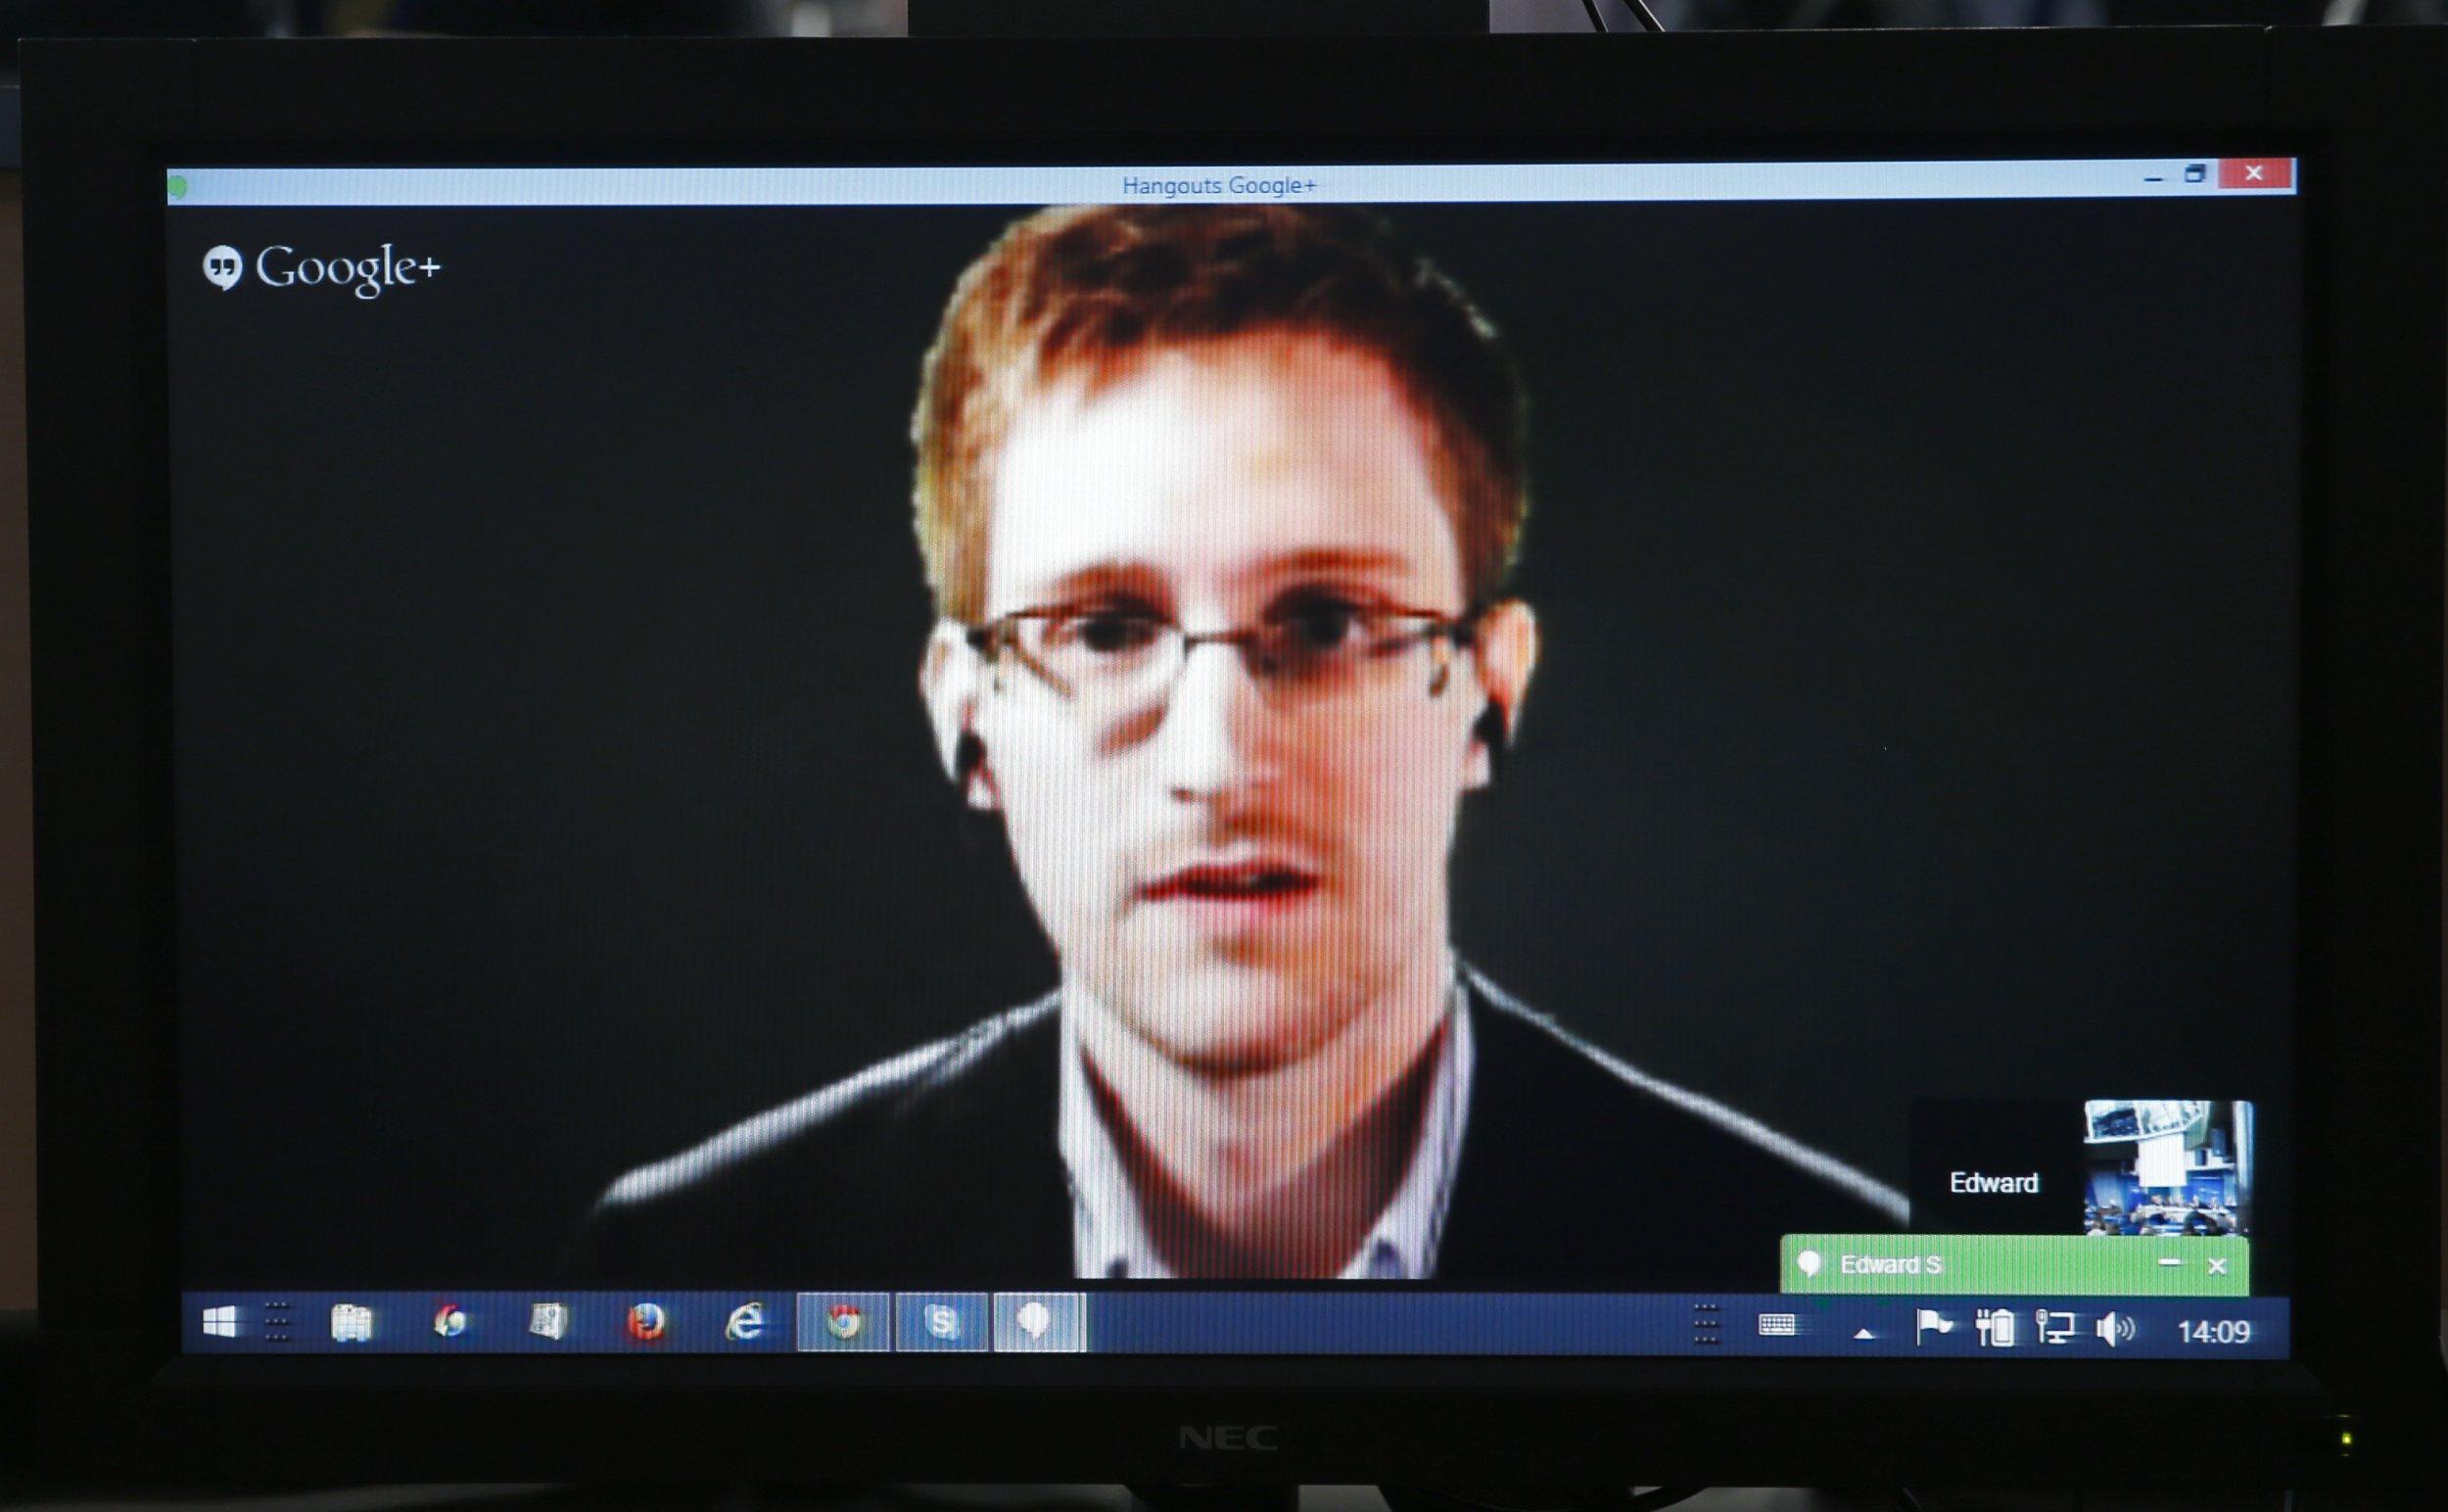 Edward Snowden appears on screen